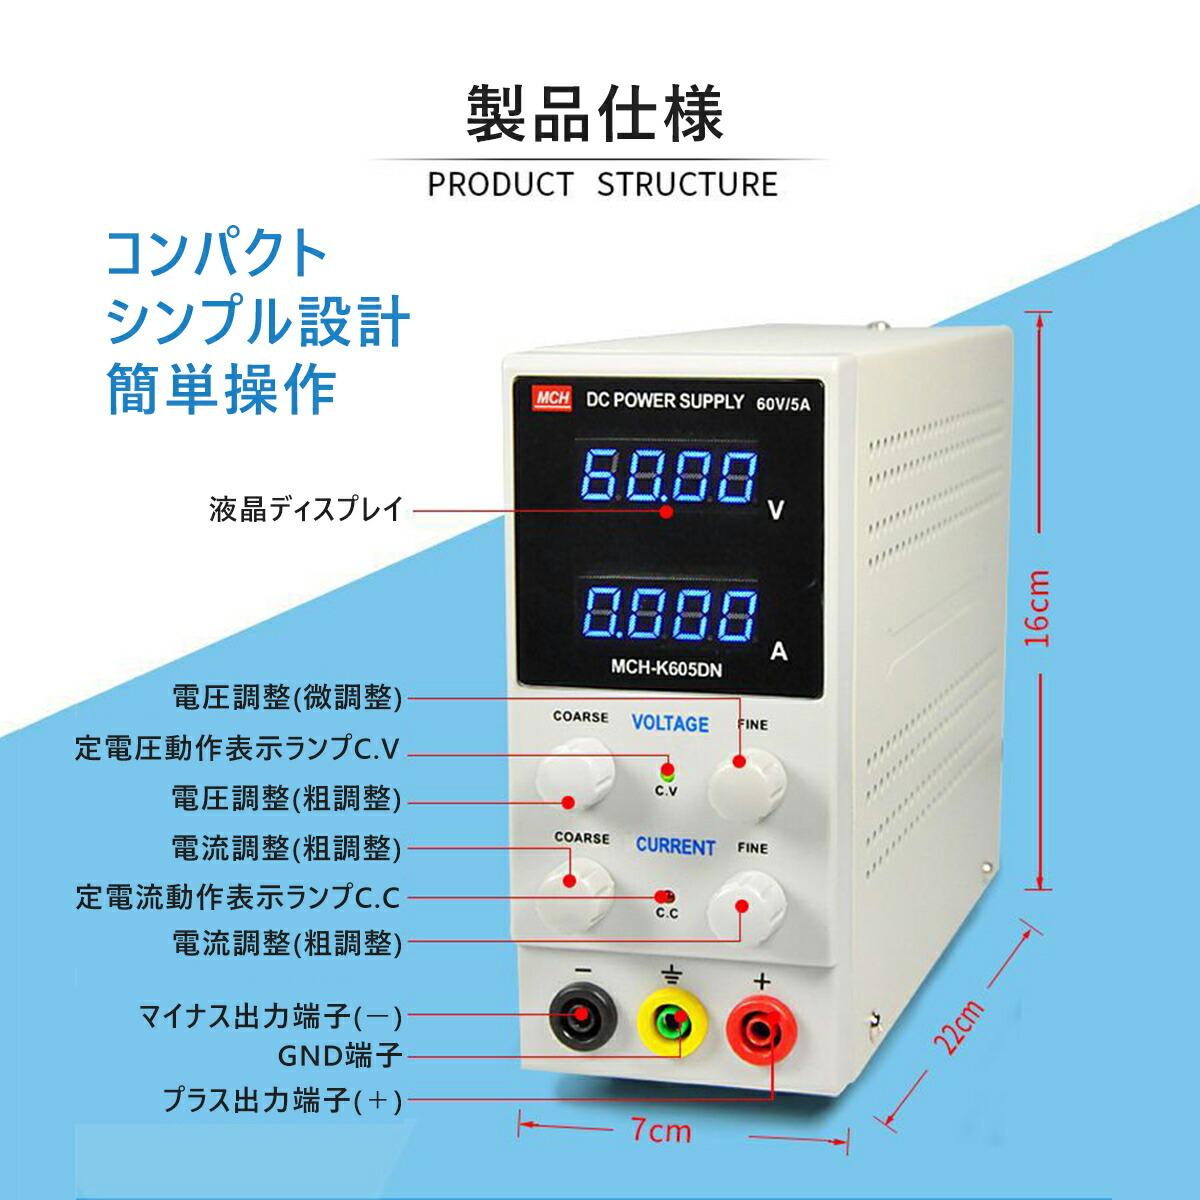 直流安定化電源(微調整対応モデル)